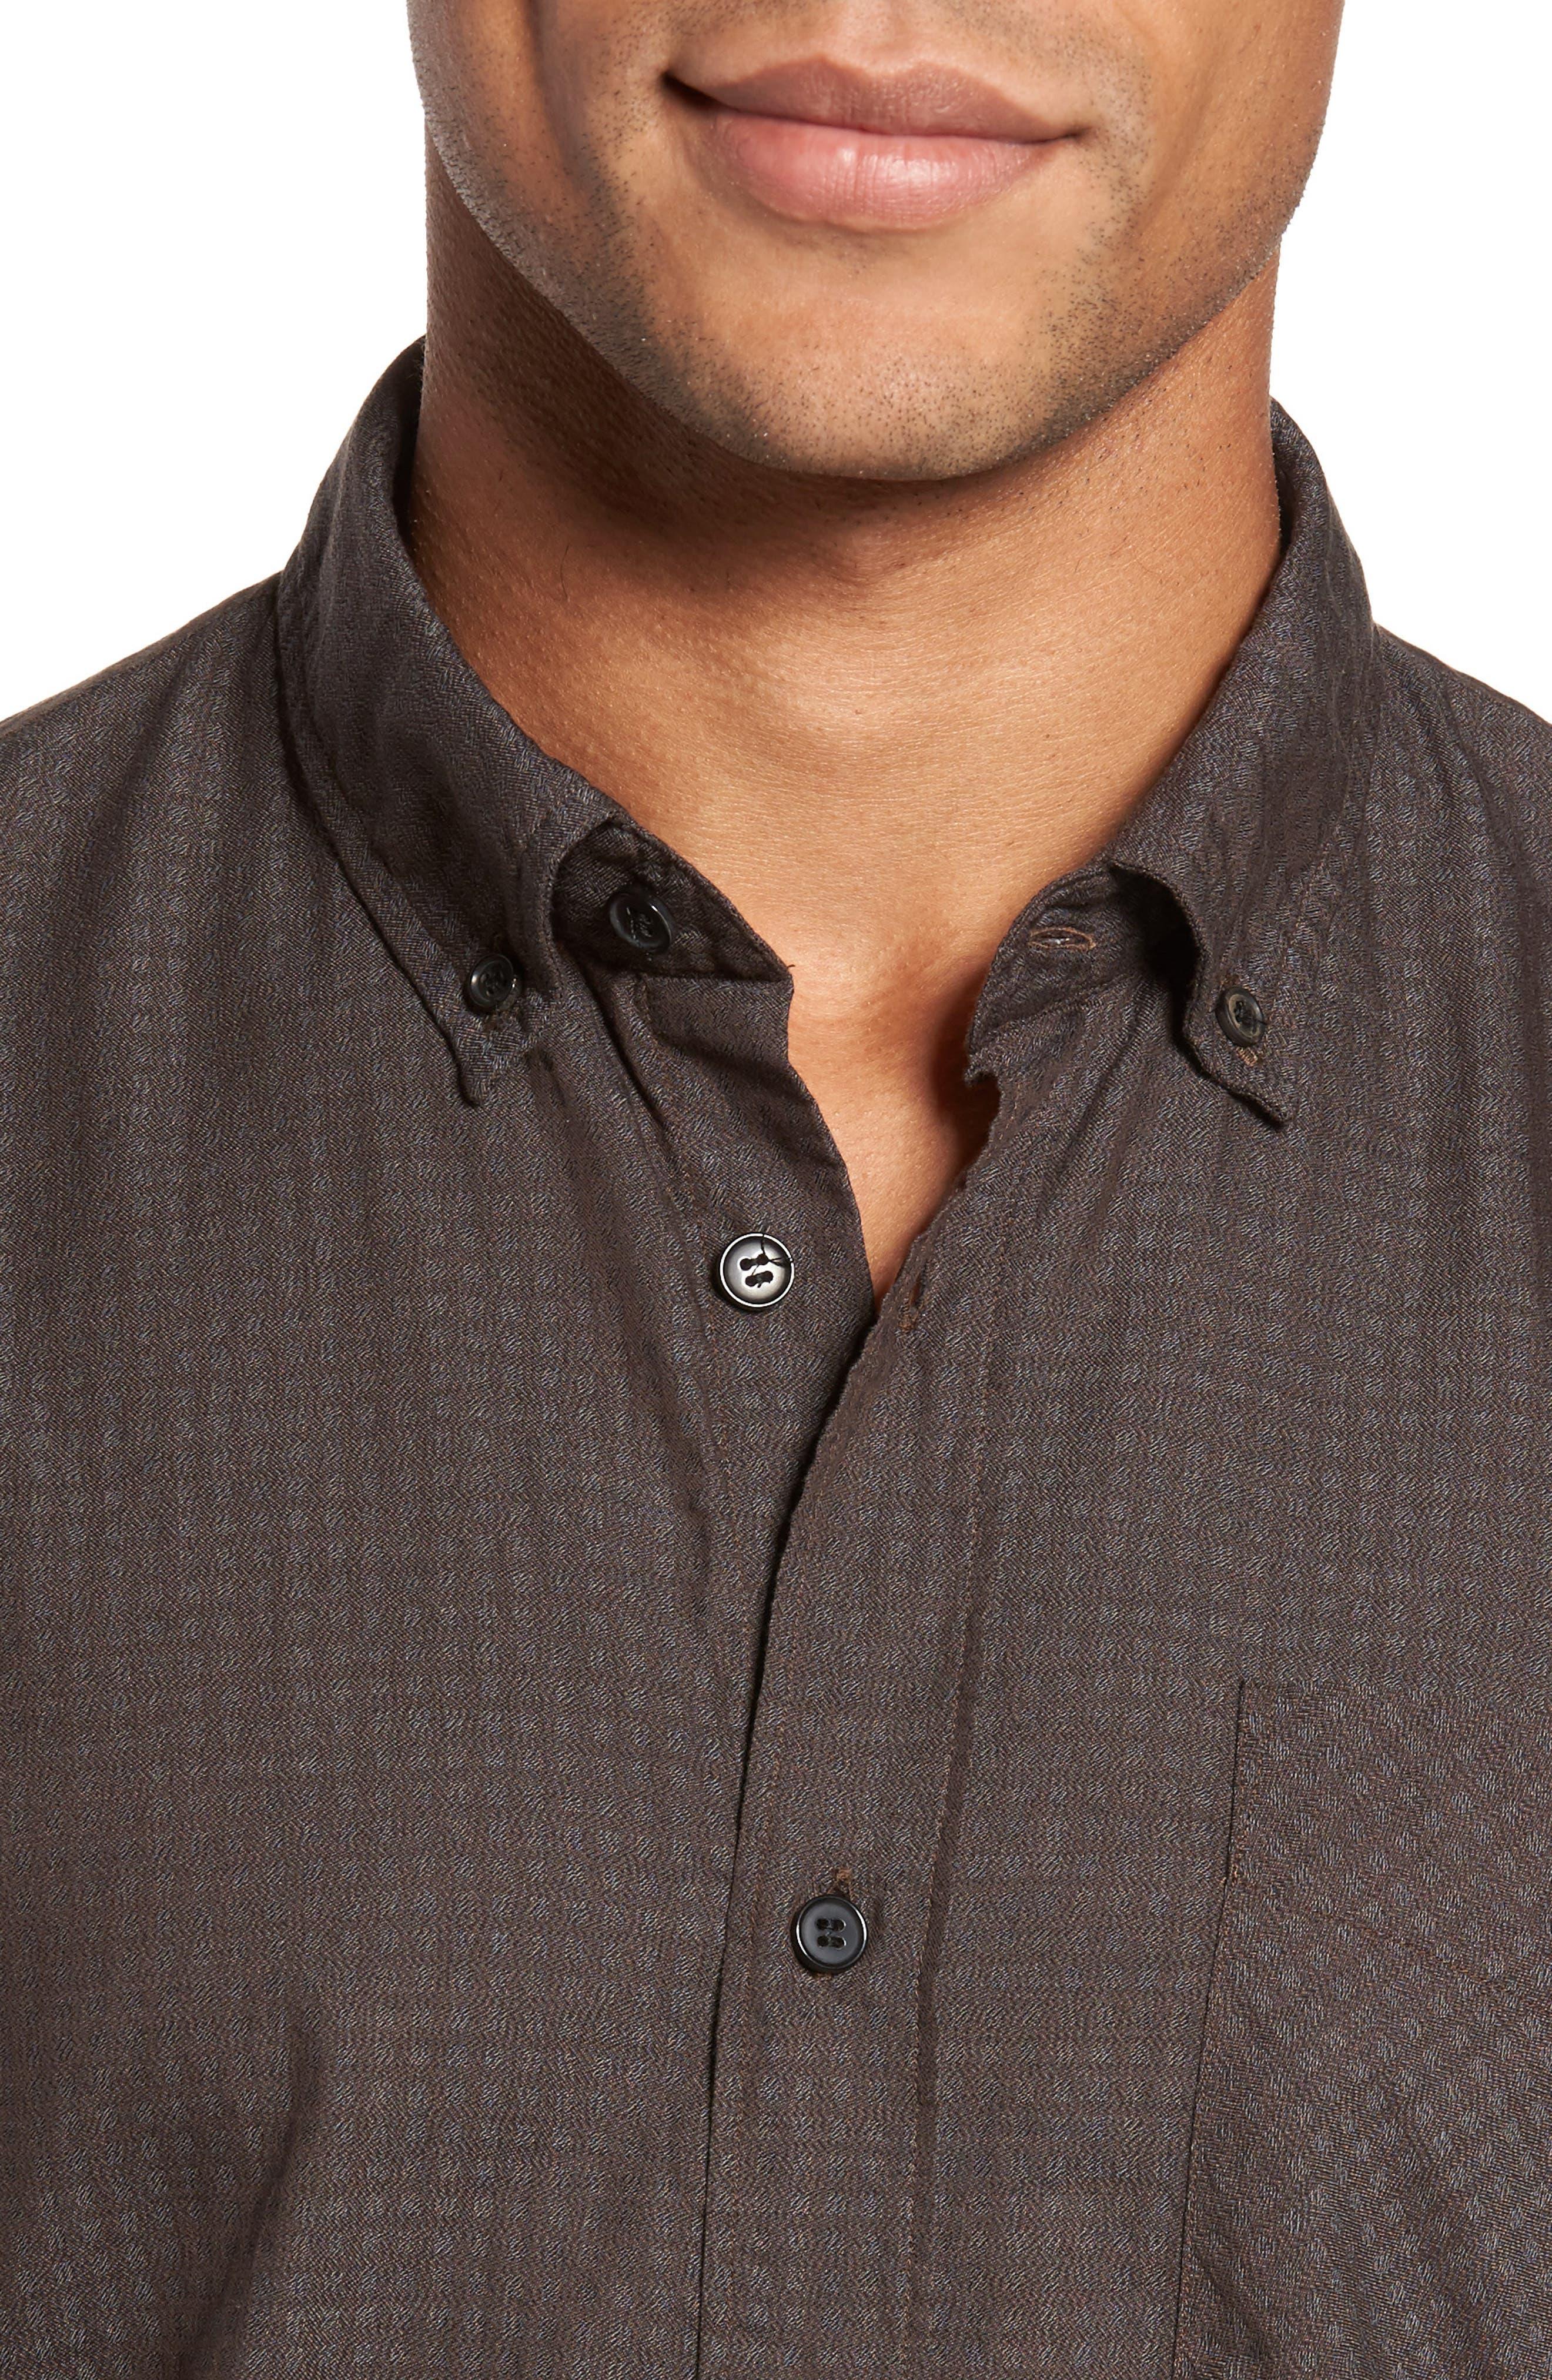 Wallace Slim Fit Sport Shirt,                             Alternate thumbnail 8, color,